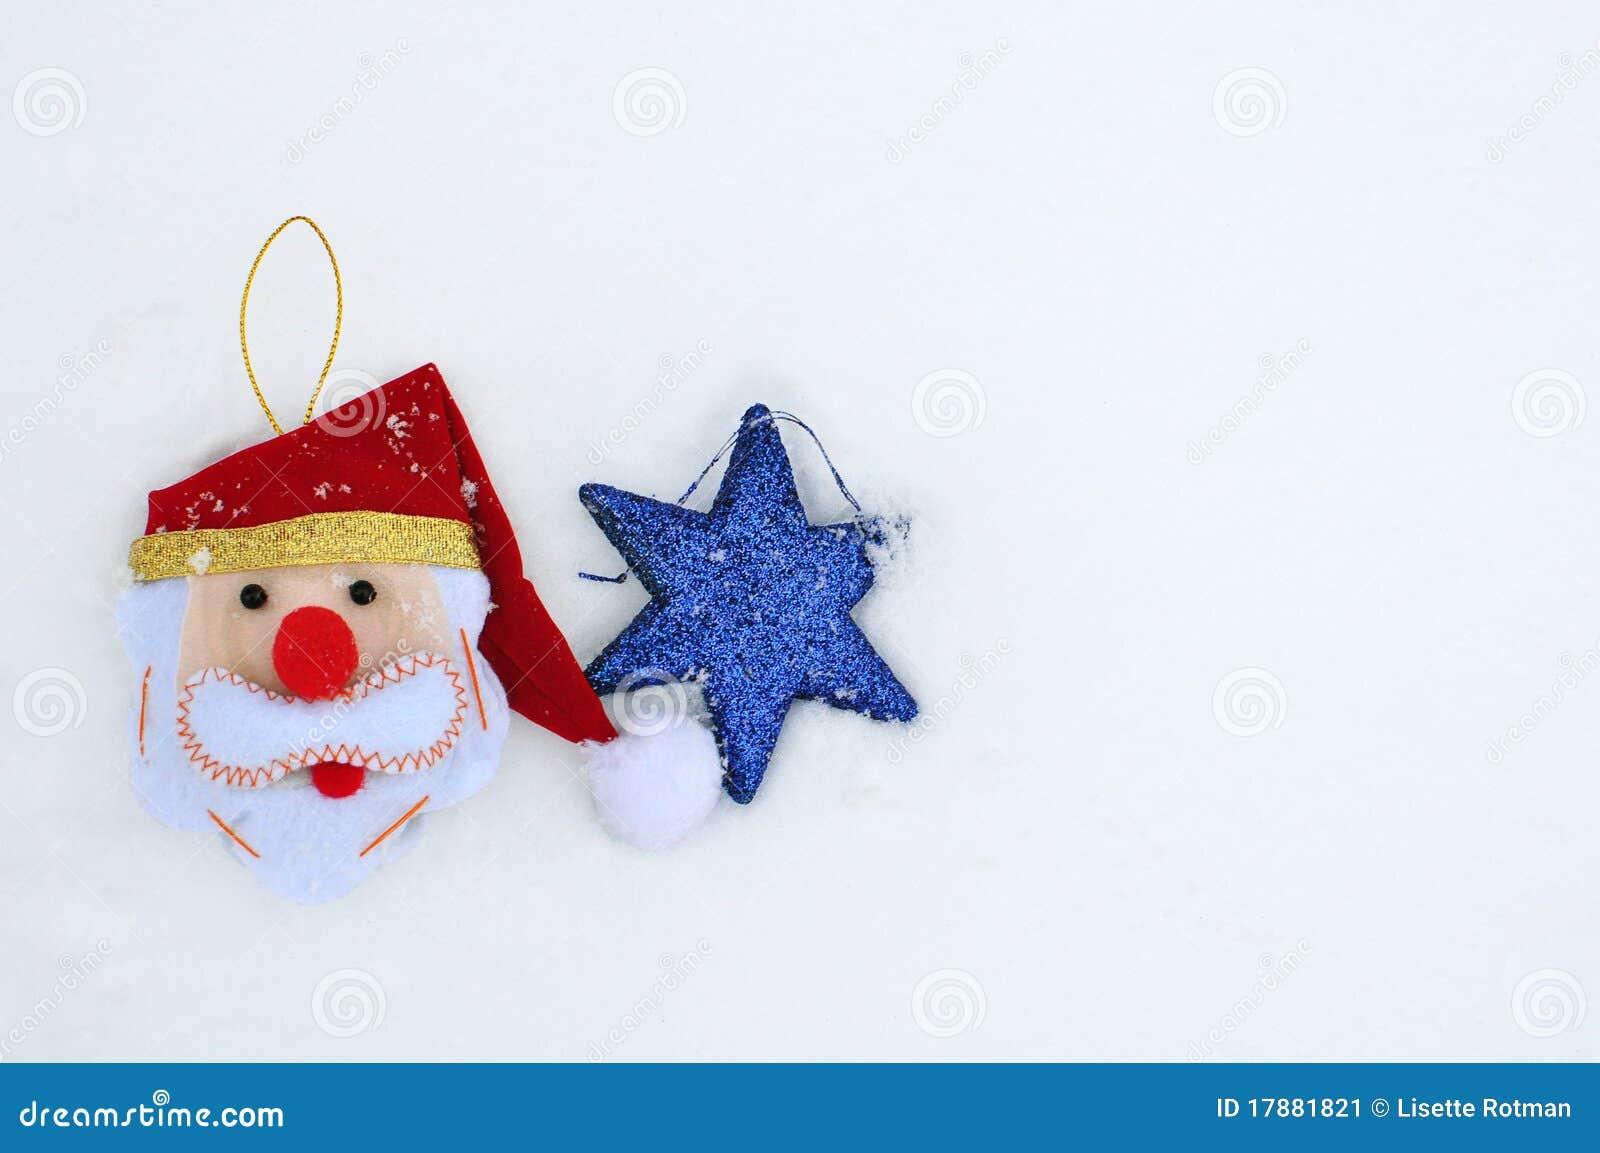 Hanukkah ornaments for a tree - Christmas David Decorations Hanukkah